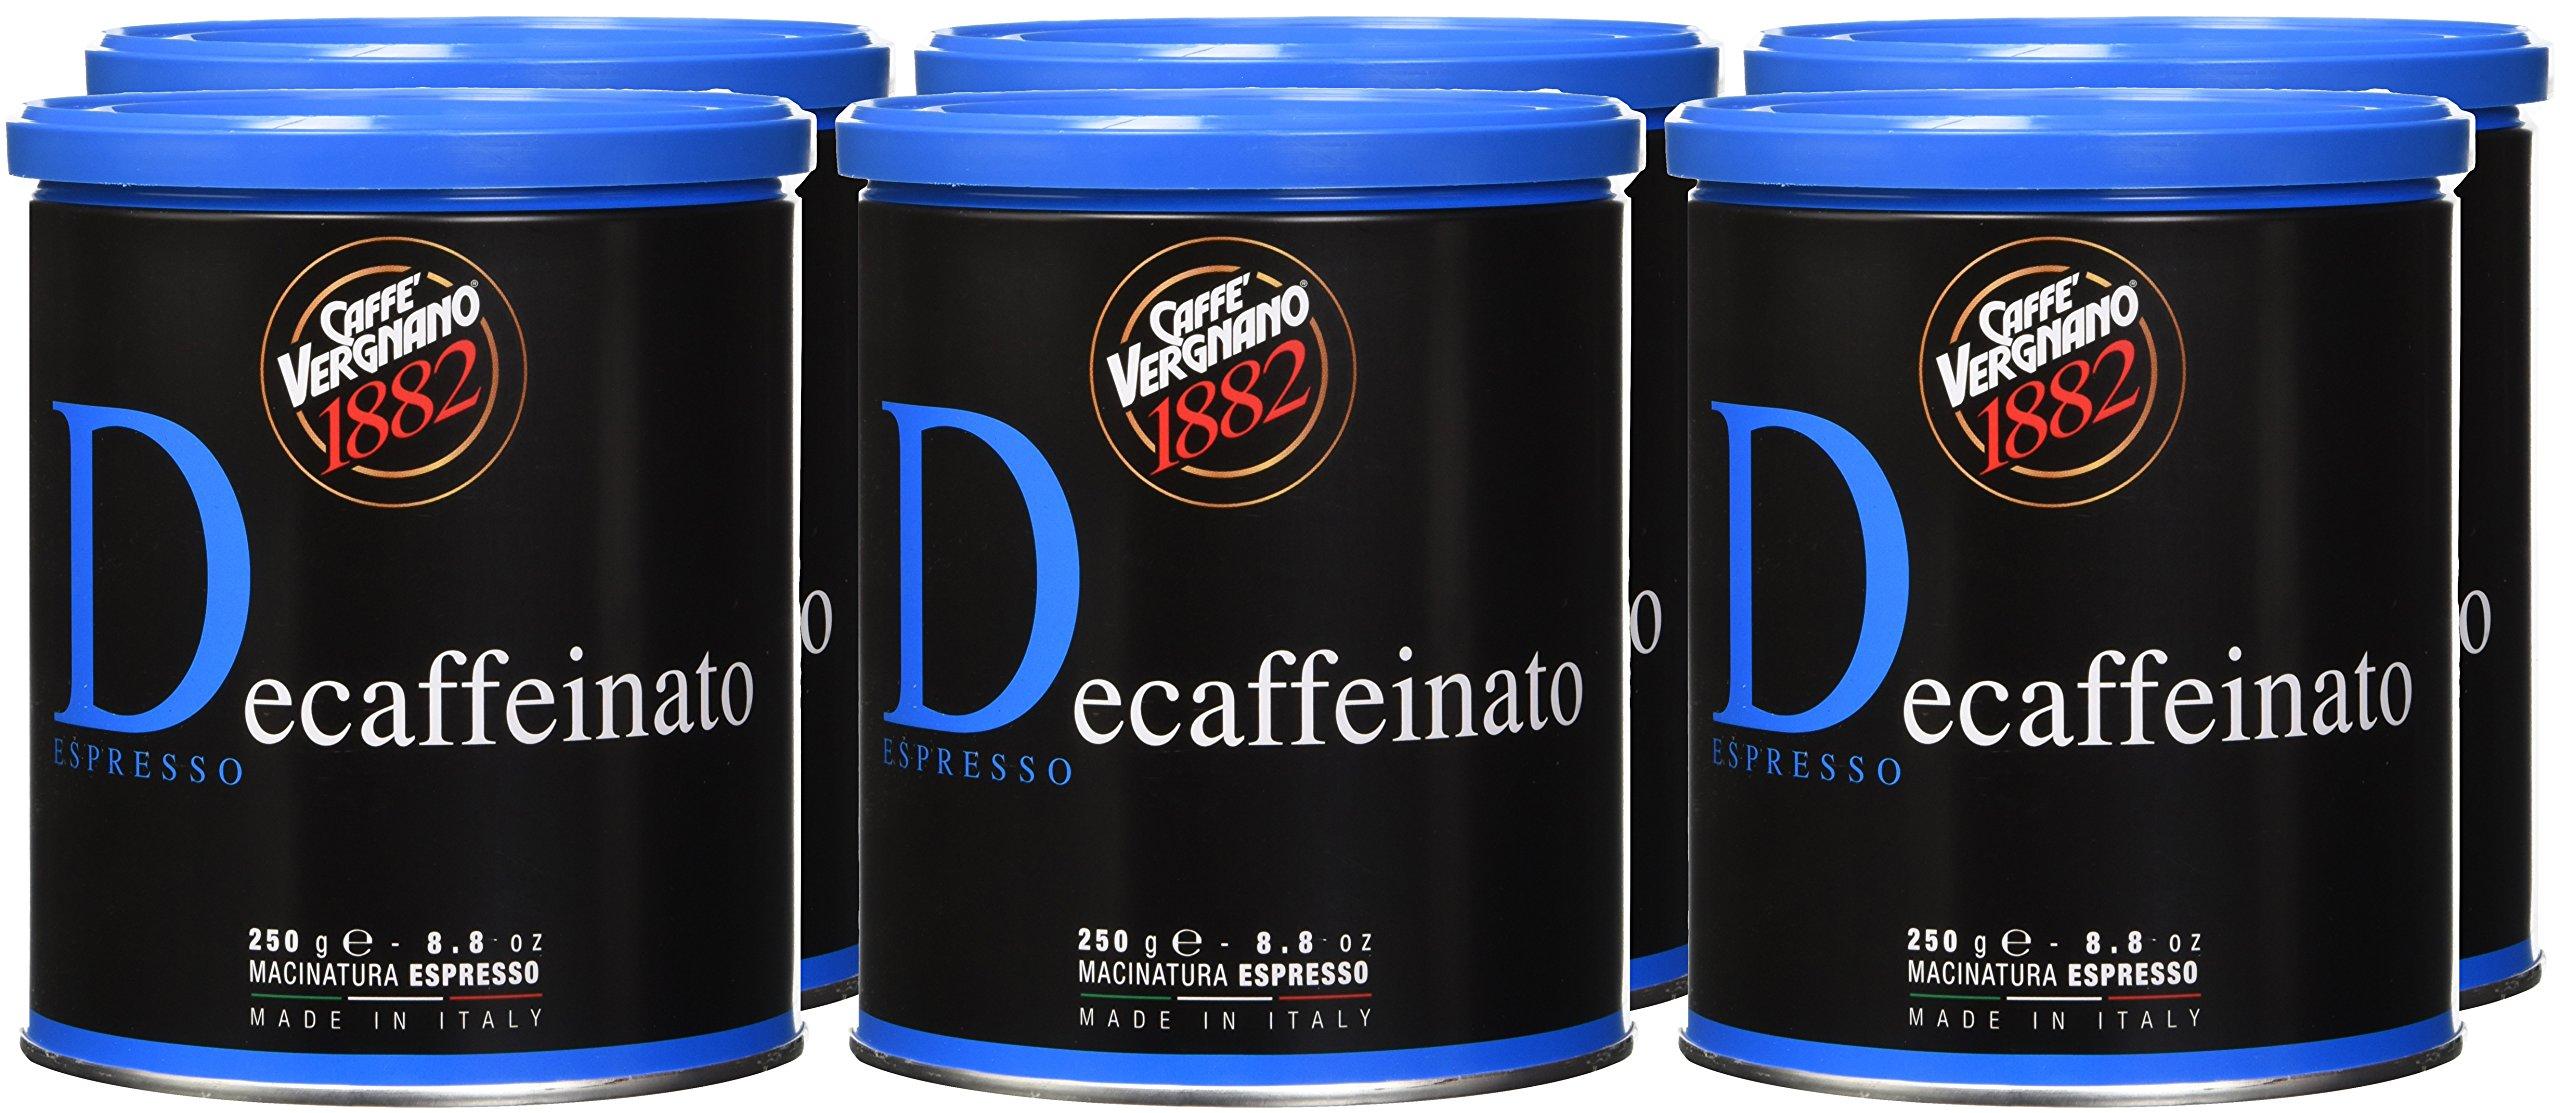 Caffè Vergnano 1882 Lattina Arabica Decaffeinata, 250 gr - 1 Pacchetto 2 spesavip